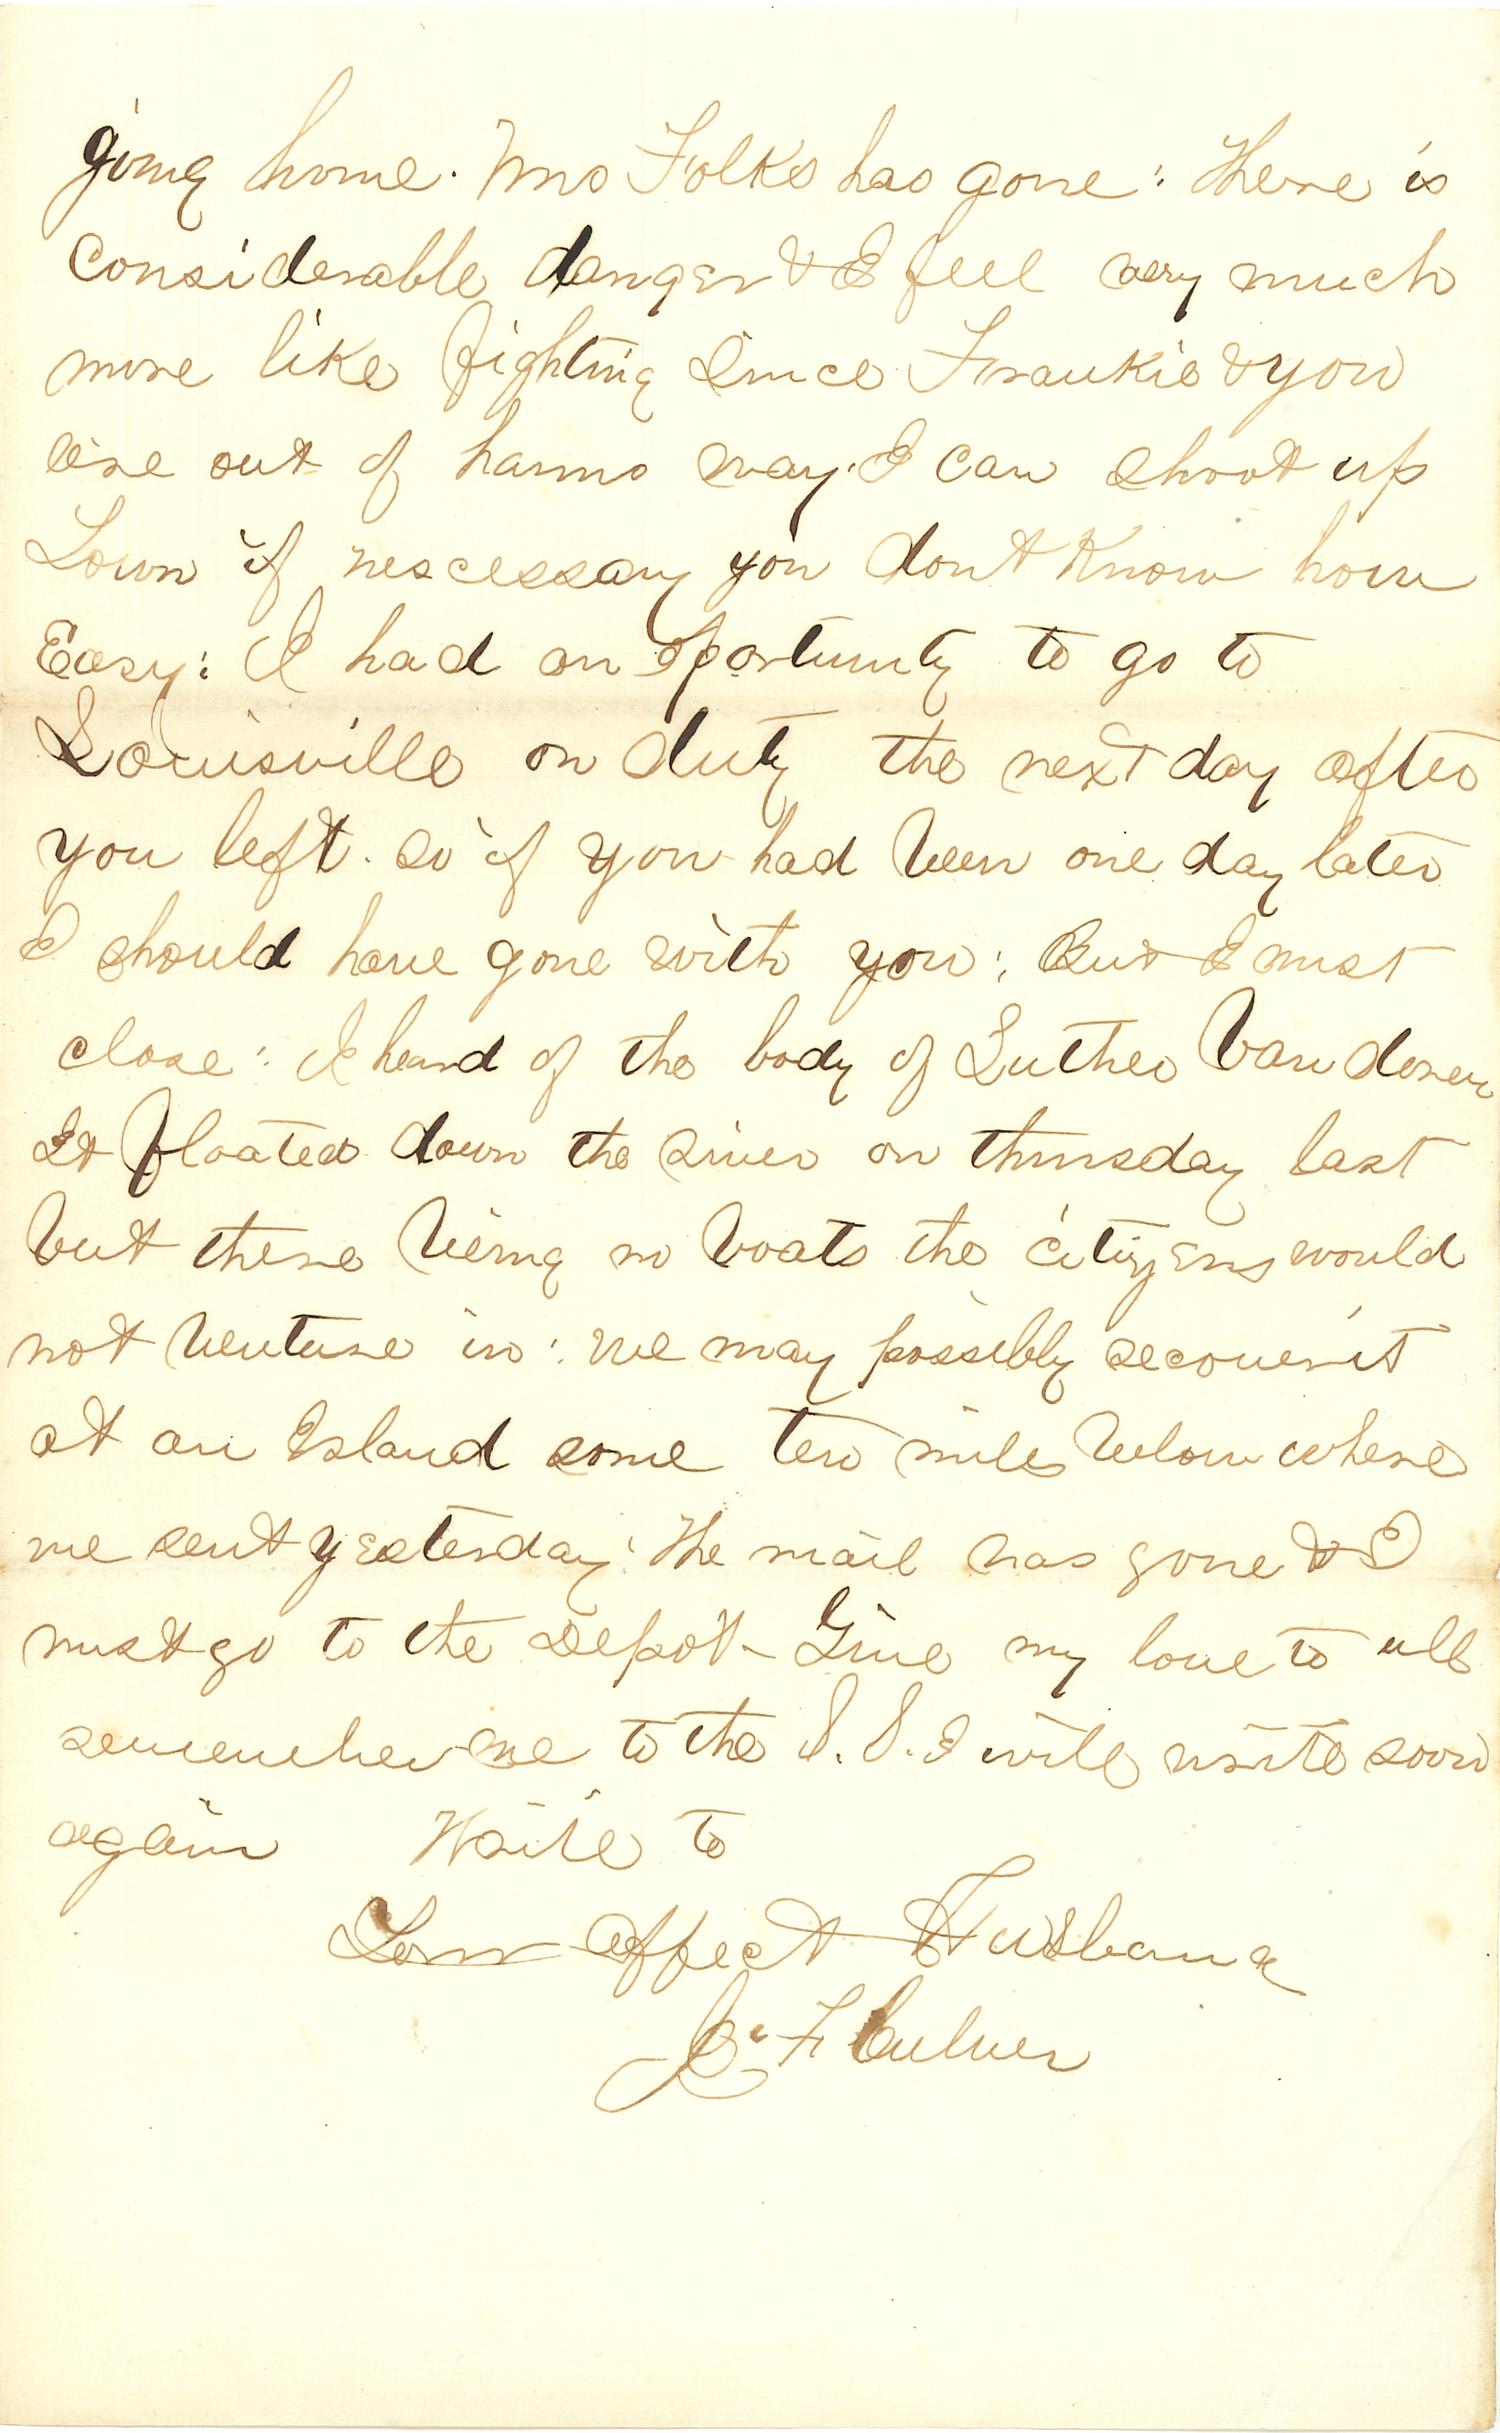 Joseph Culver Letter, June 22, 1863, Page 3